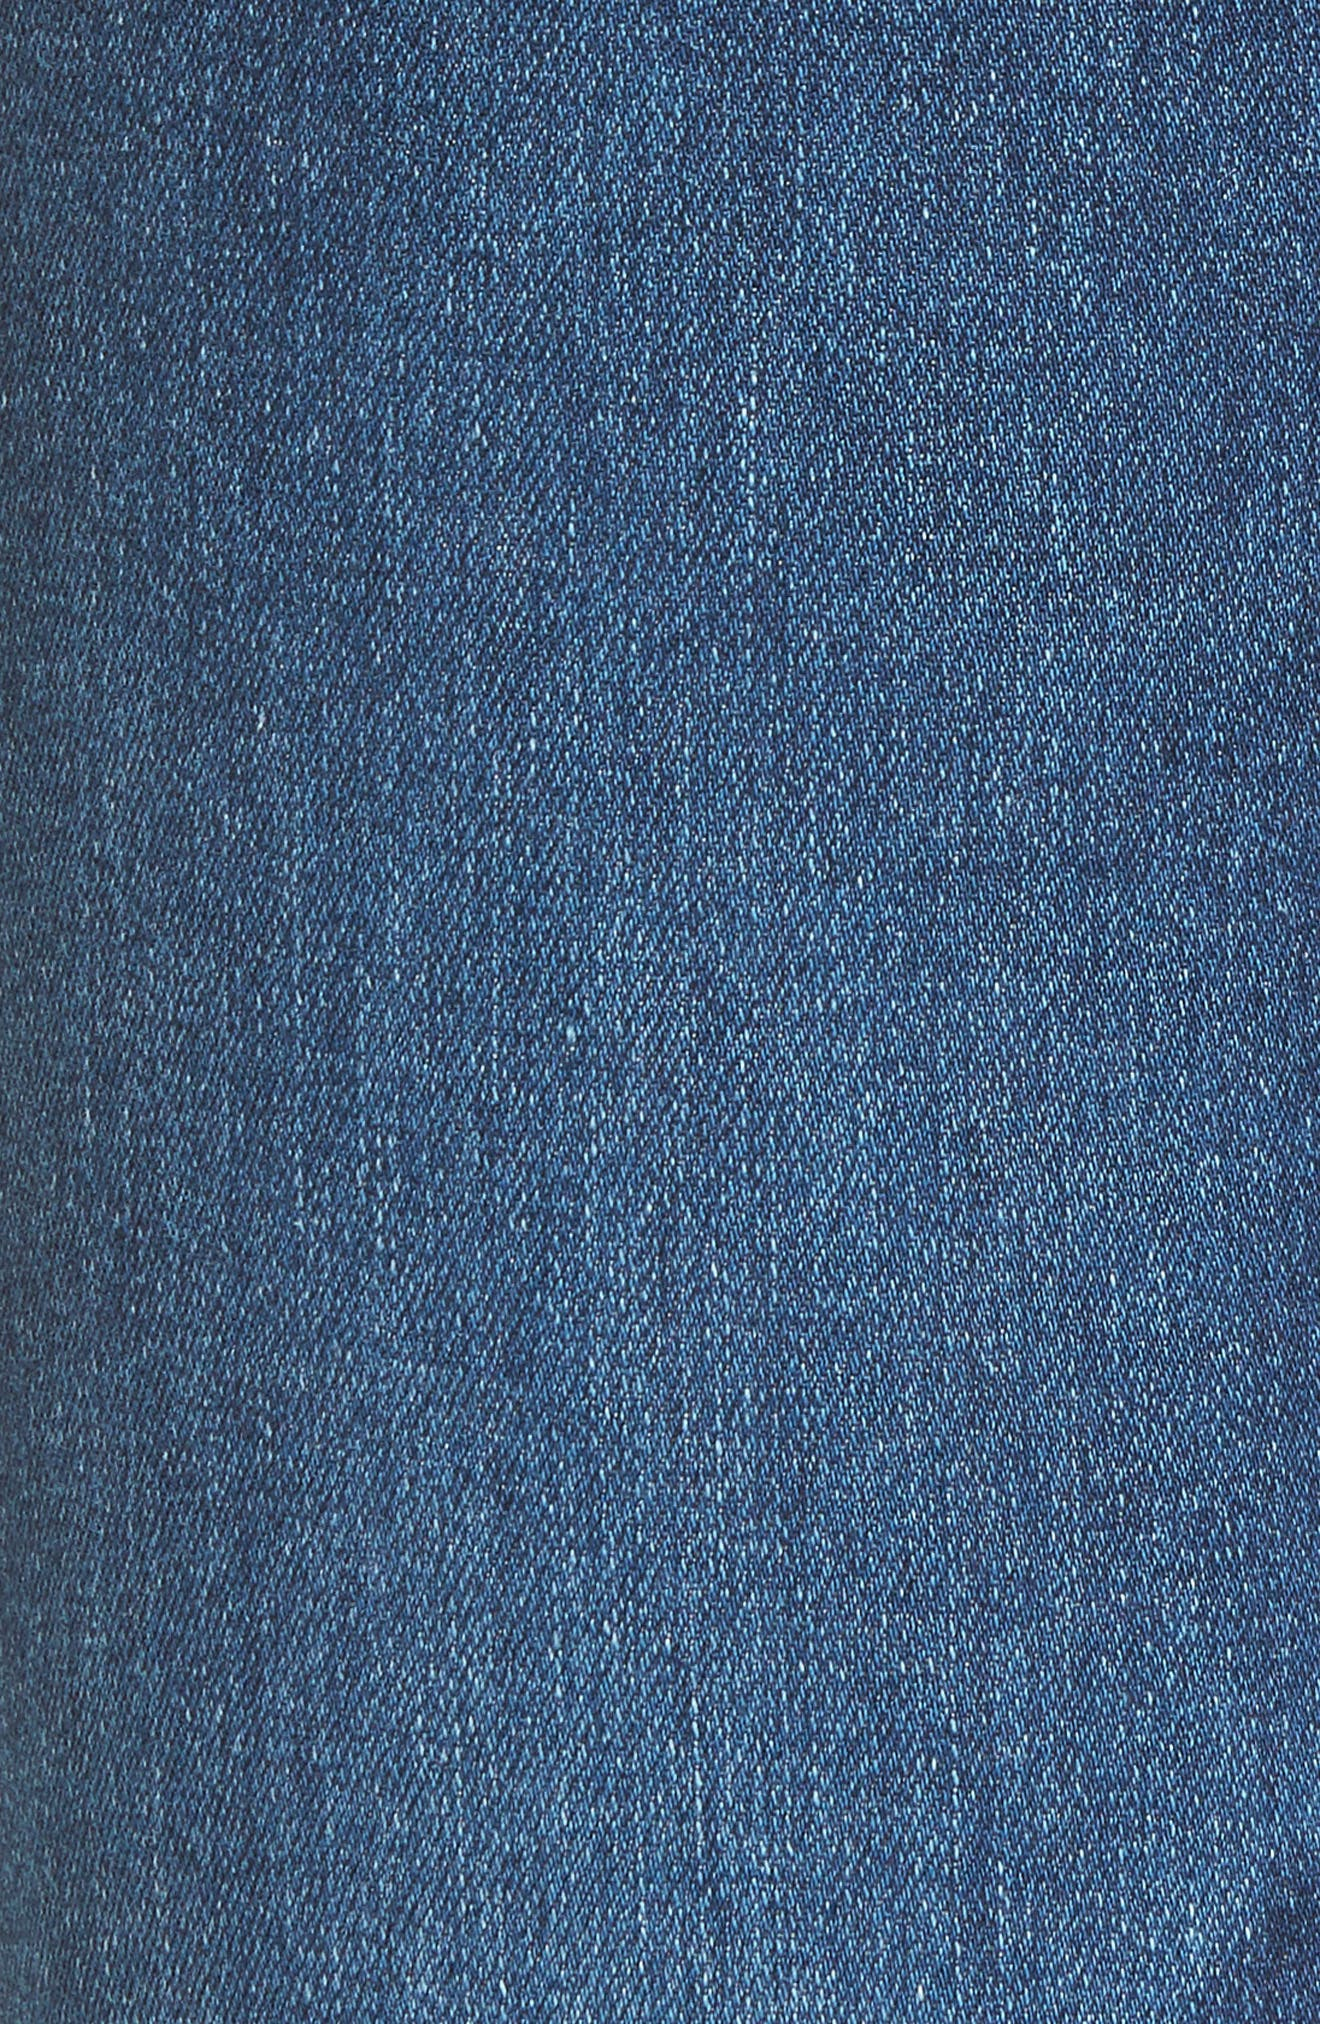 Harper Slim Straight Leg Jeans,                             Alternate thumbnail 6, color,                             8 YEARS BLUE PORTRAIT